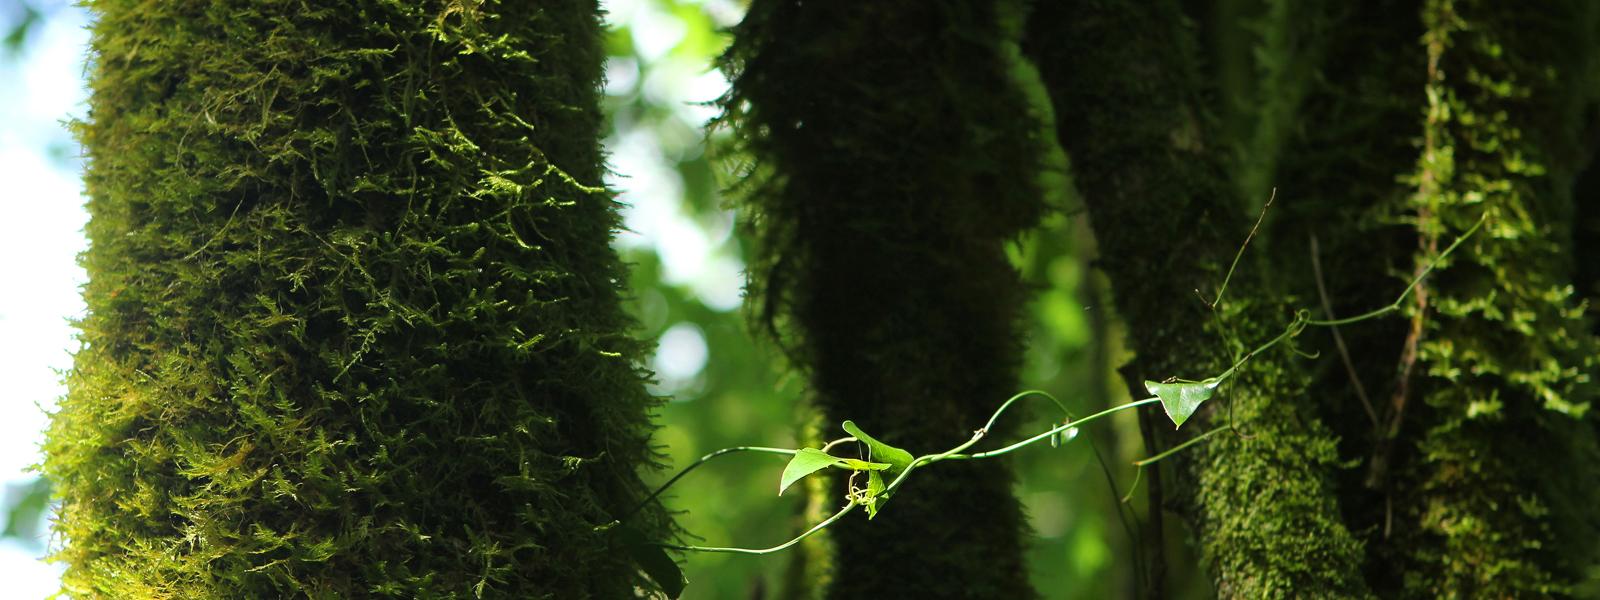 Basque Green Spirit